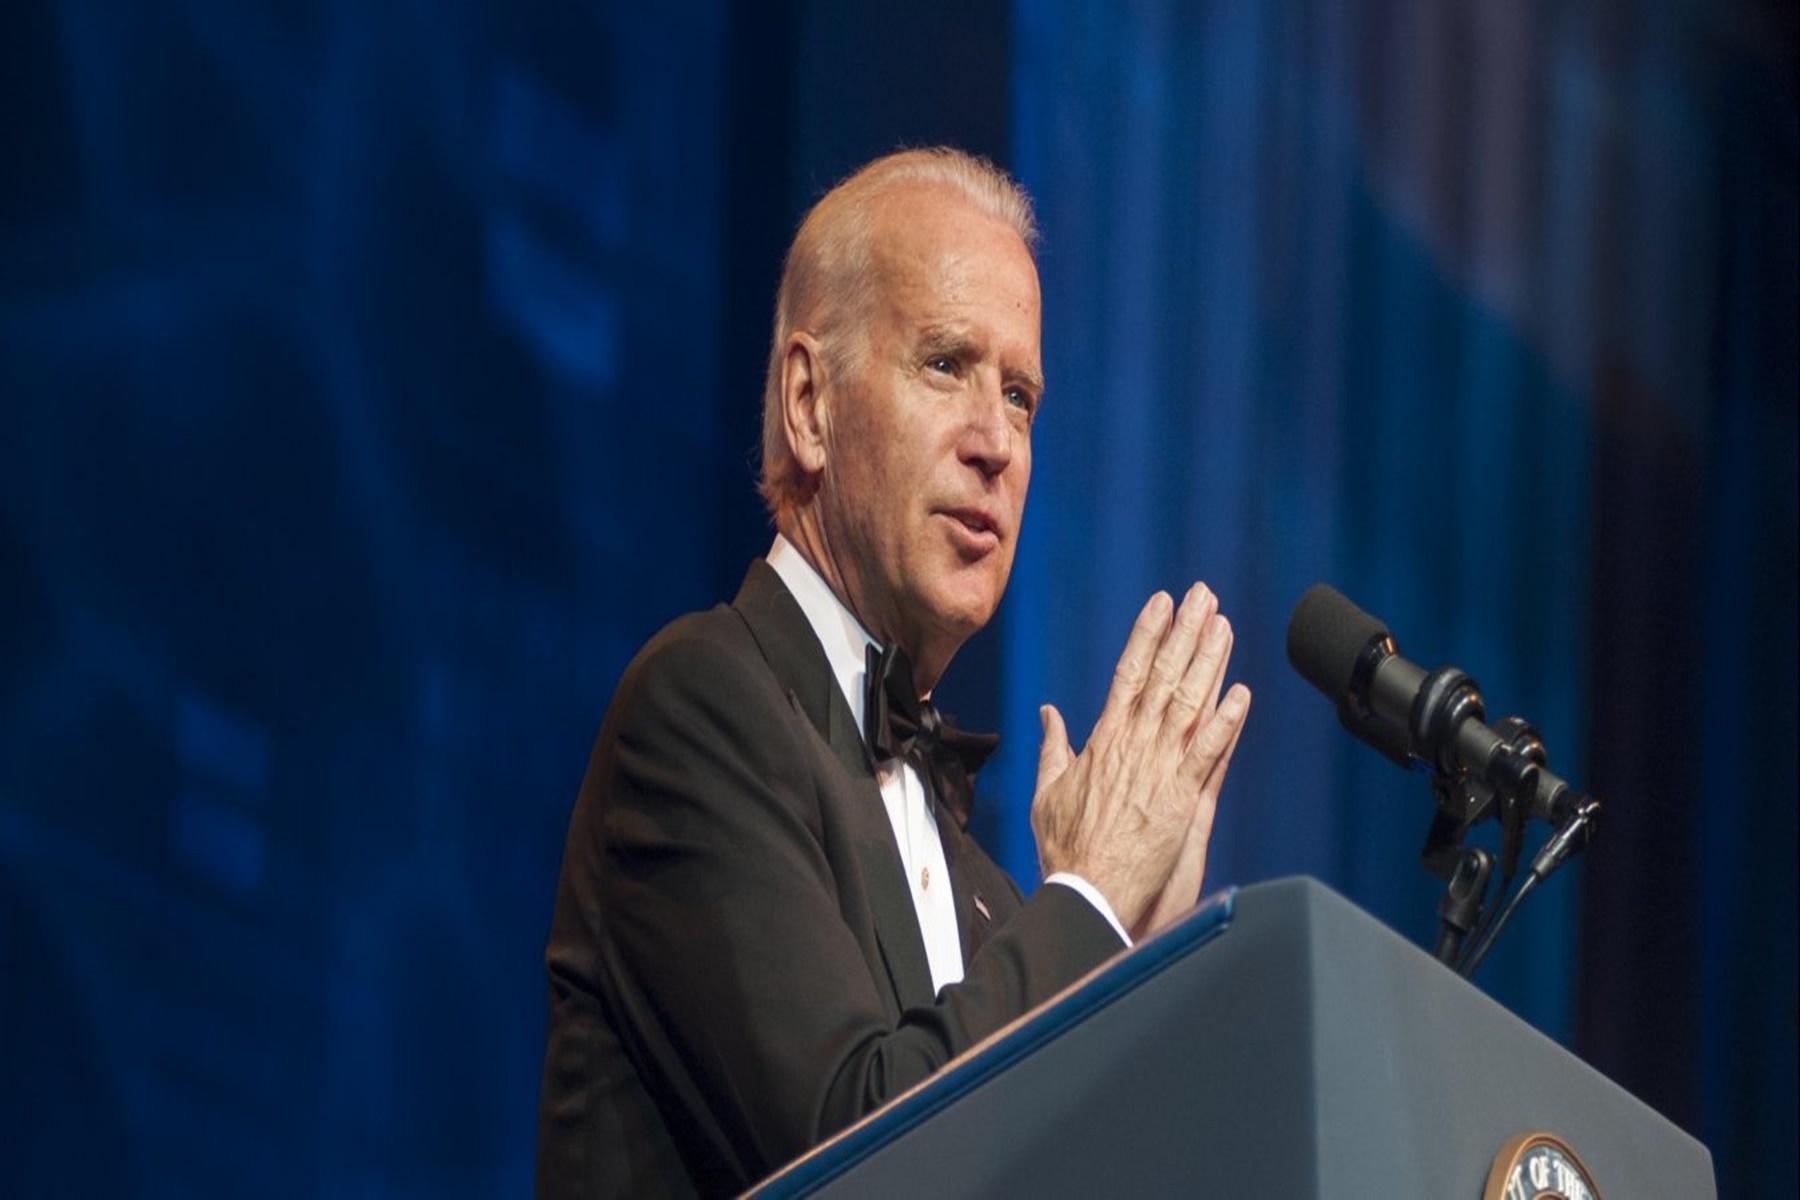 Joe Biden : Οι Ρεμπουπλικανοί εμποδίζουν τον τερματισμό της πανδημίας